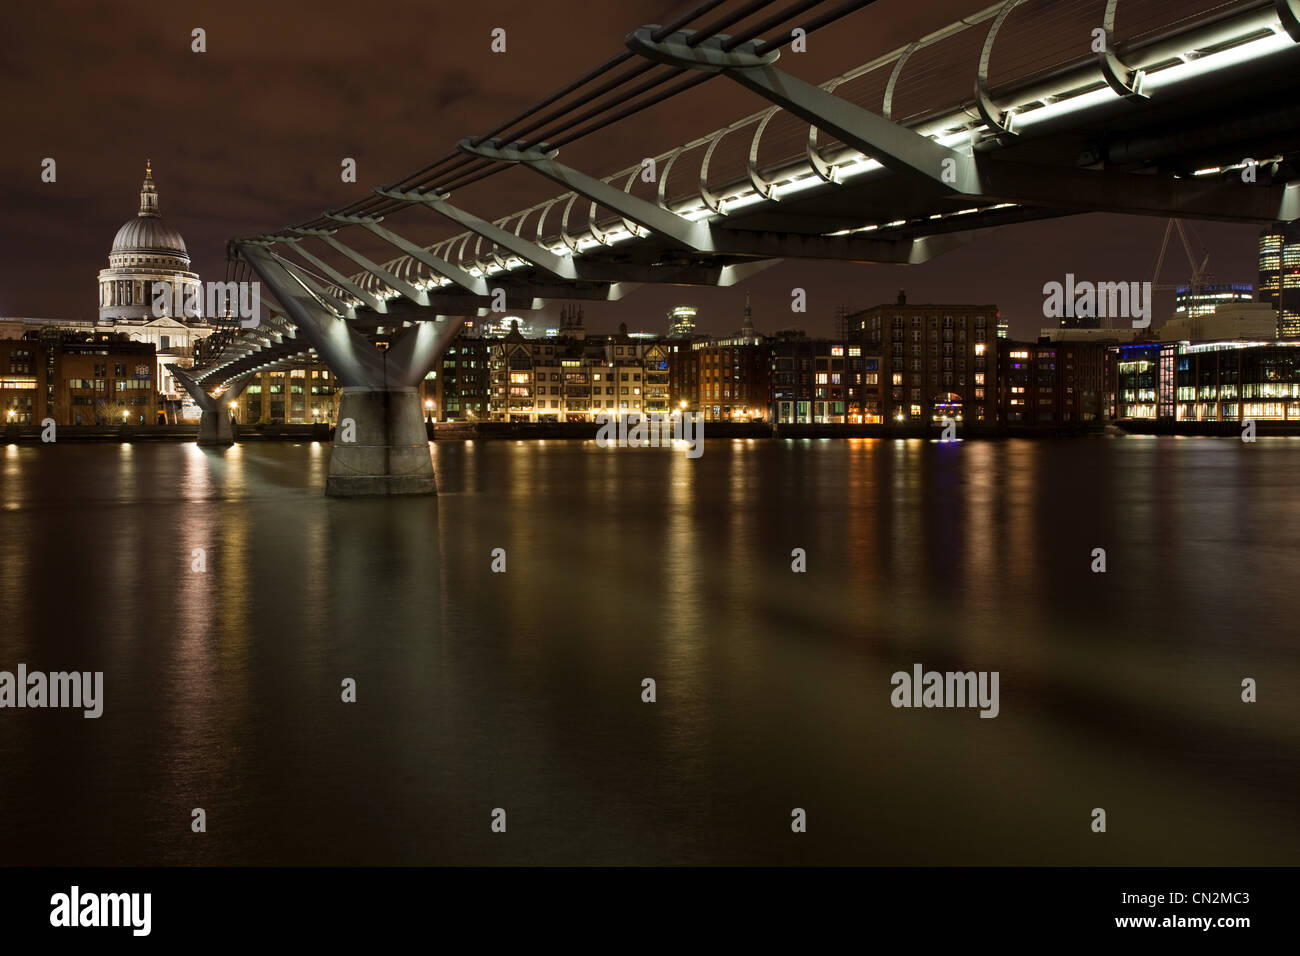 Millennium Bridge and River Thames, London, UK - Stock Image